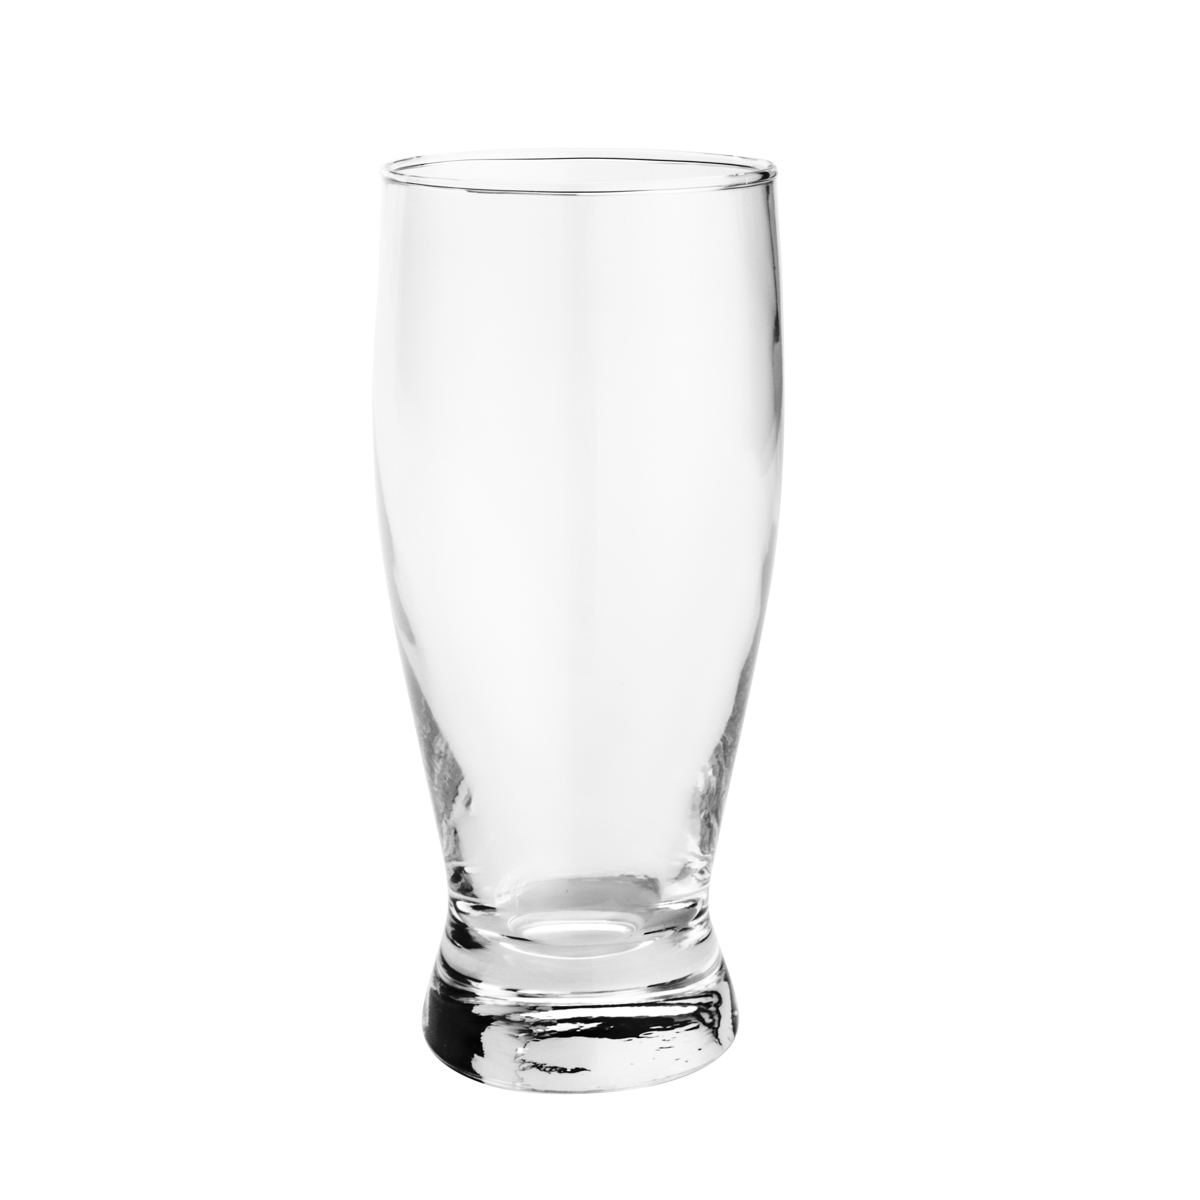 Conjunto 6 copos vidro para cerveja 340ml 6,5x15,5cm Lyor